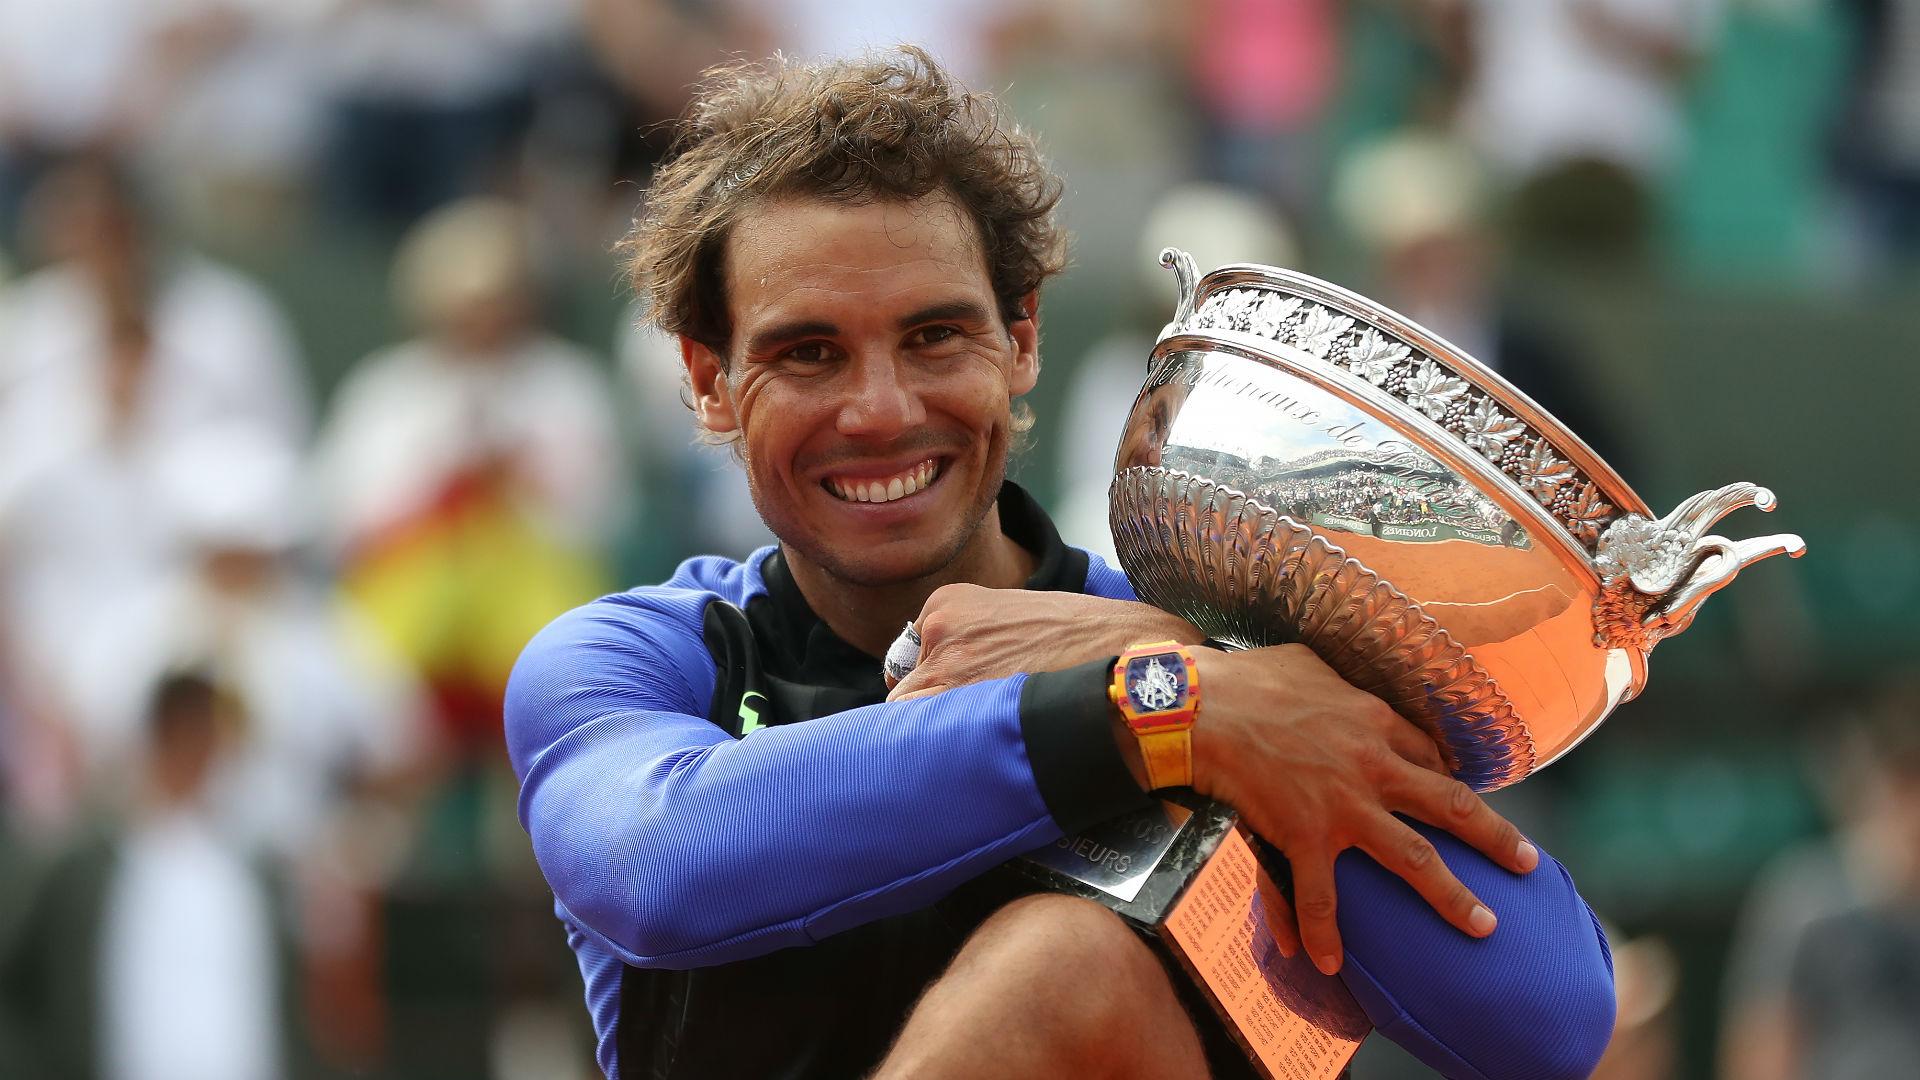 French Open: Rafael Nadal draws Alexandr Dolgopolov - Sporting News